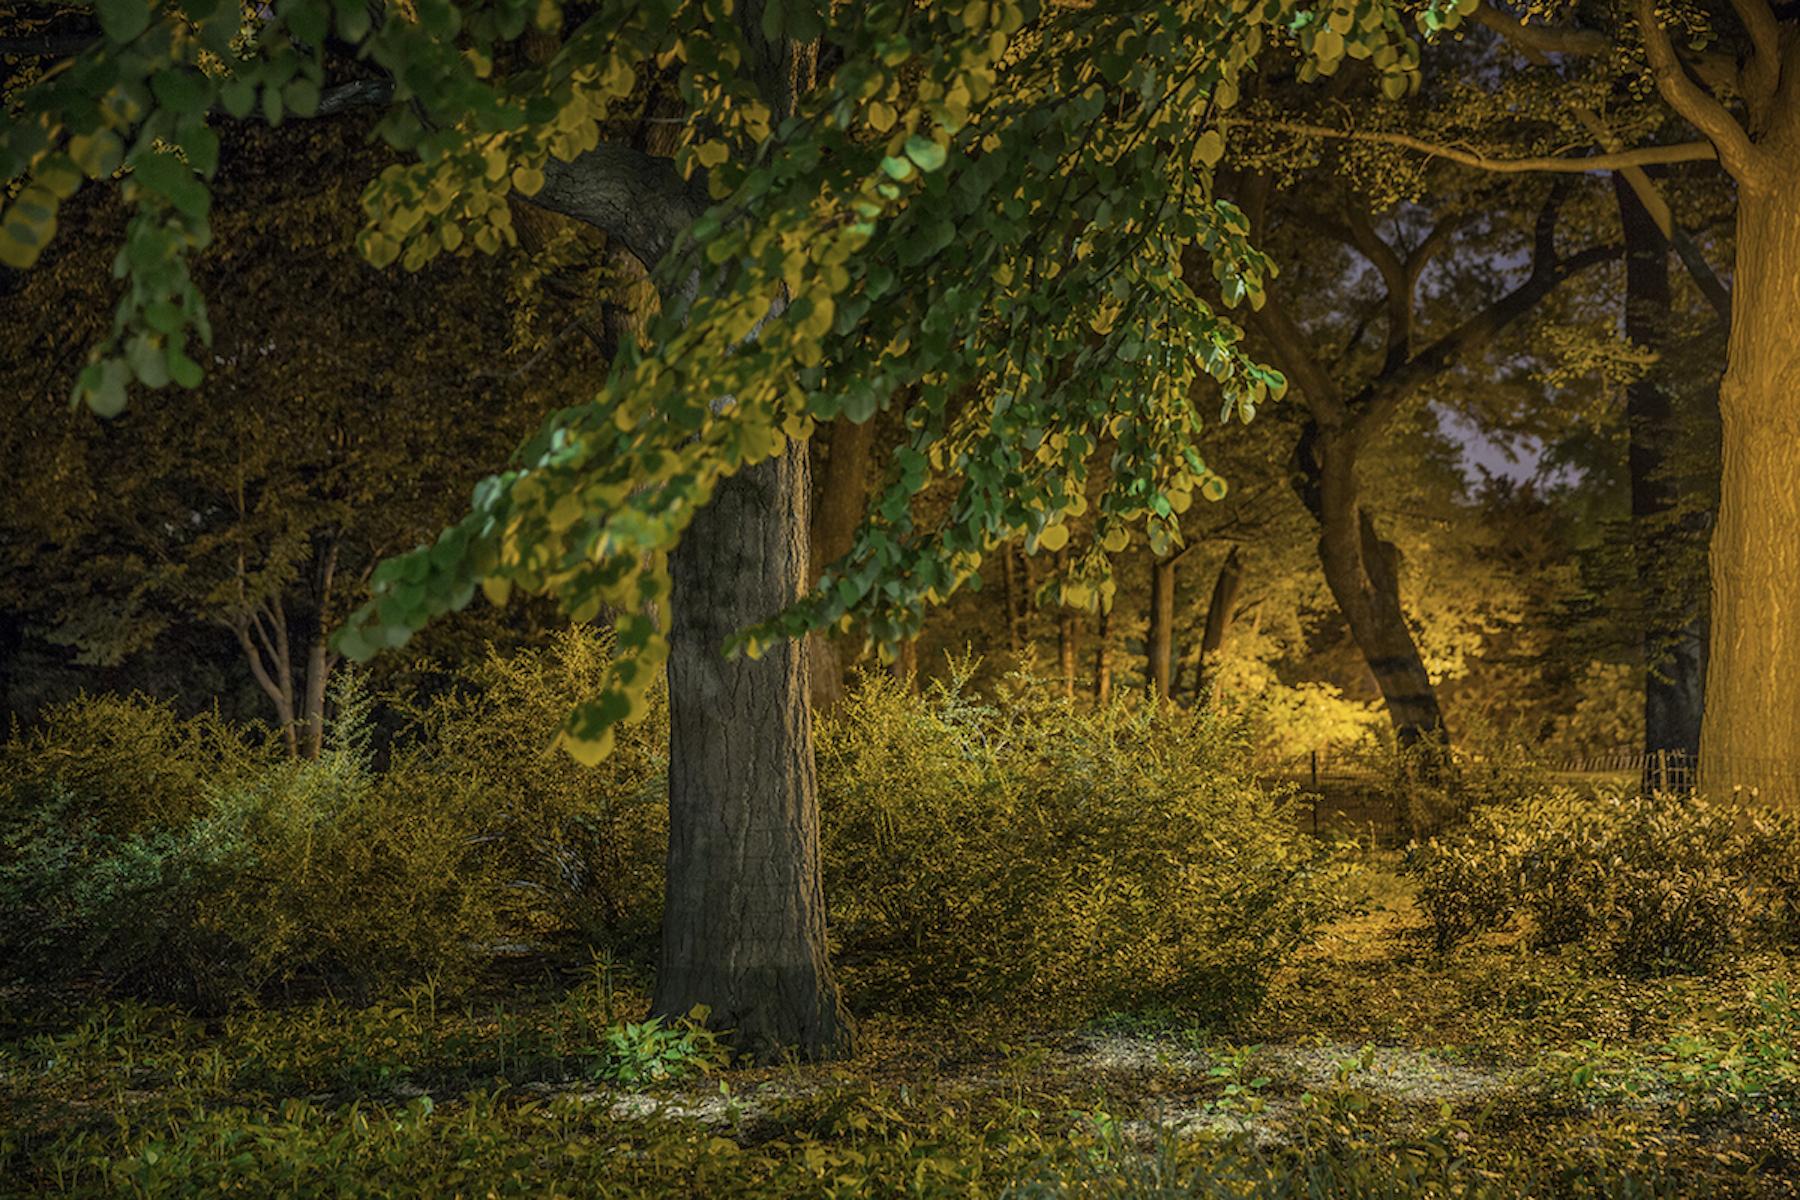 Sue_Bailey_Night Trees_Into the Breeze_5.jpg